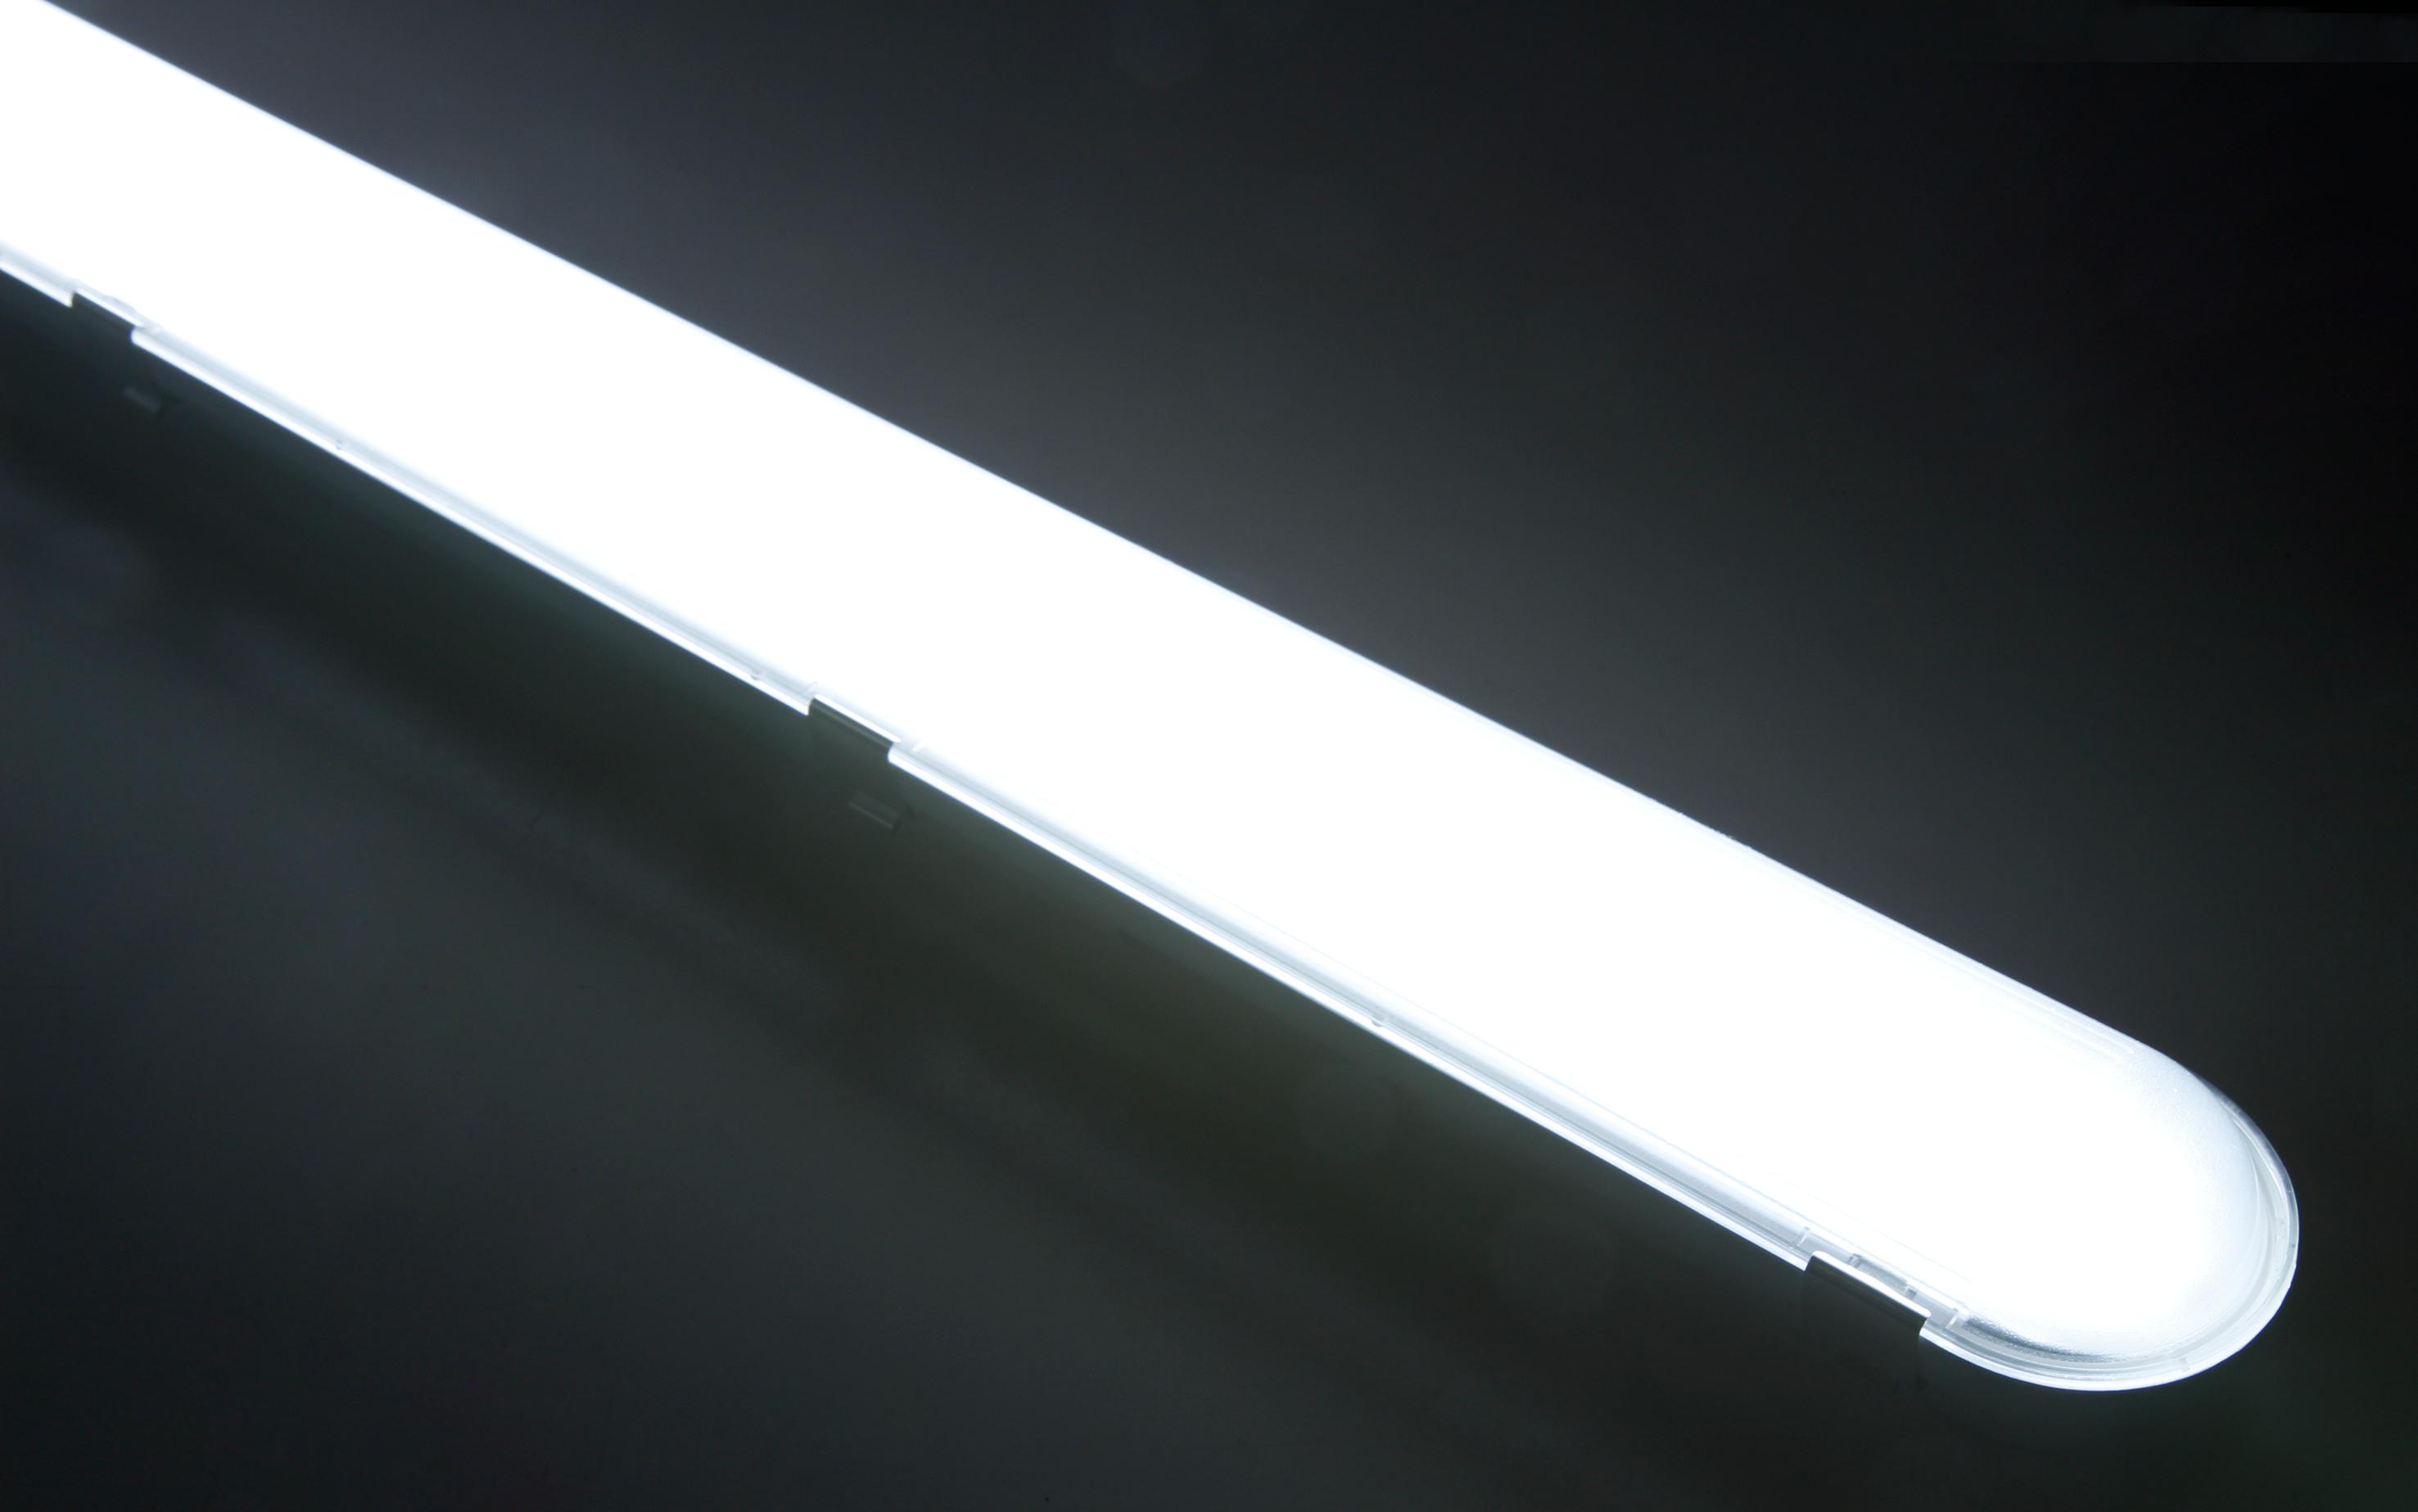 LED Feuchtraumleuchte McShine ''FL-212'', IP65, 5.400lm, 4000K, 120cm, neutralweiß